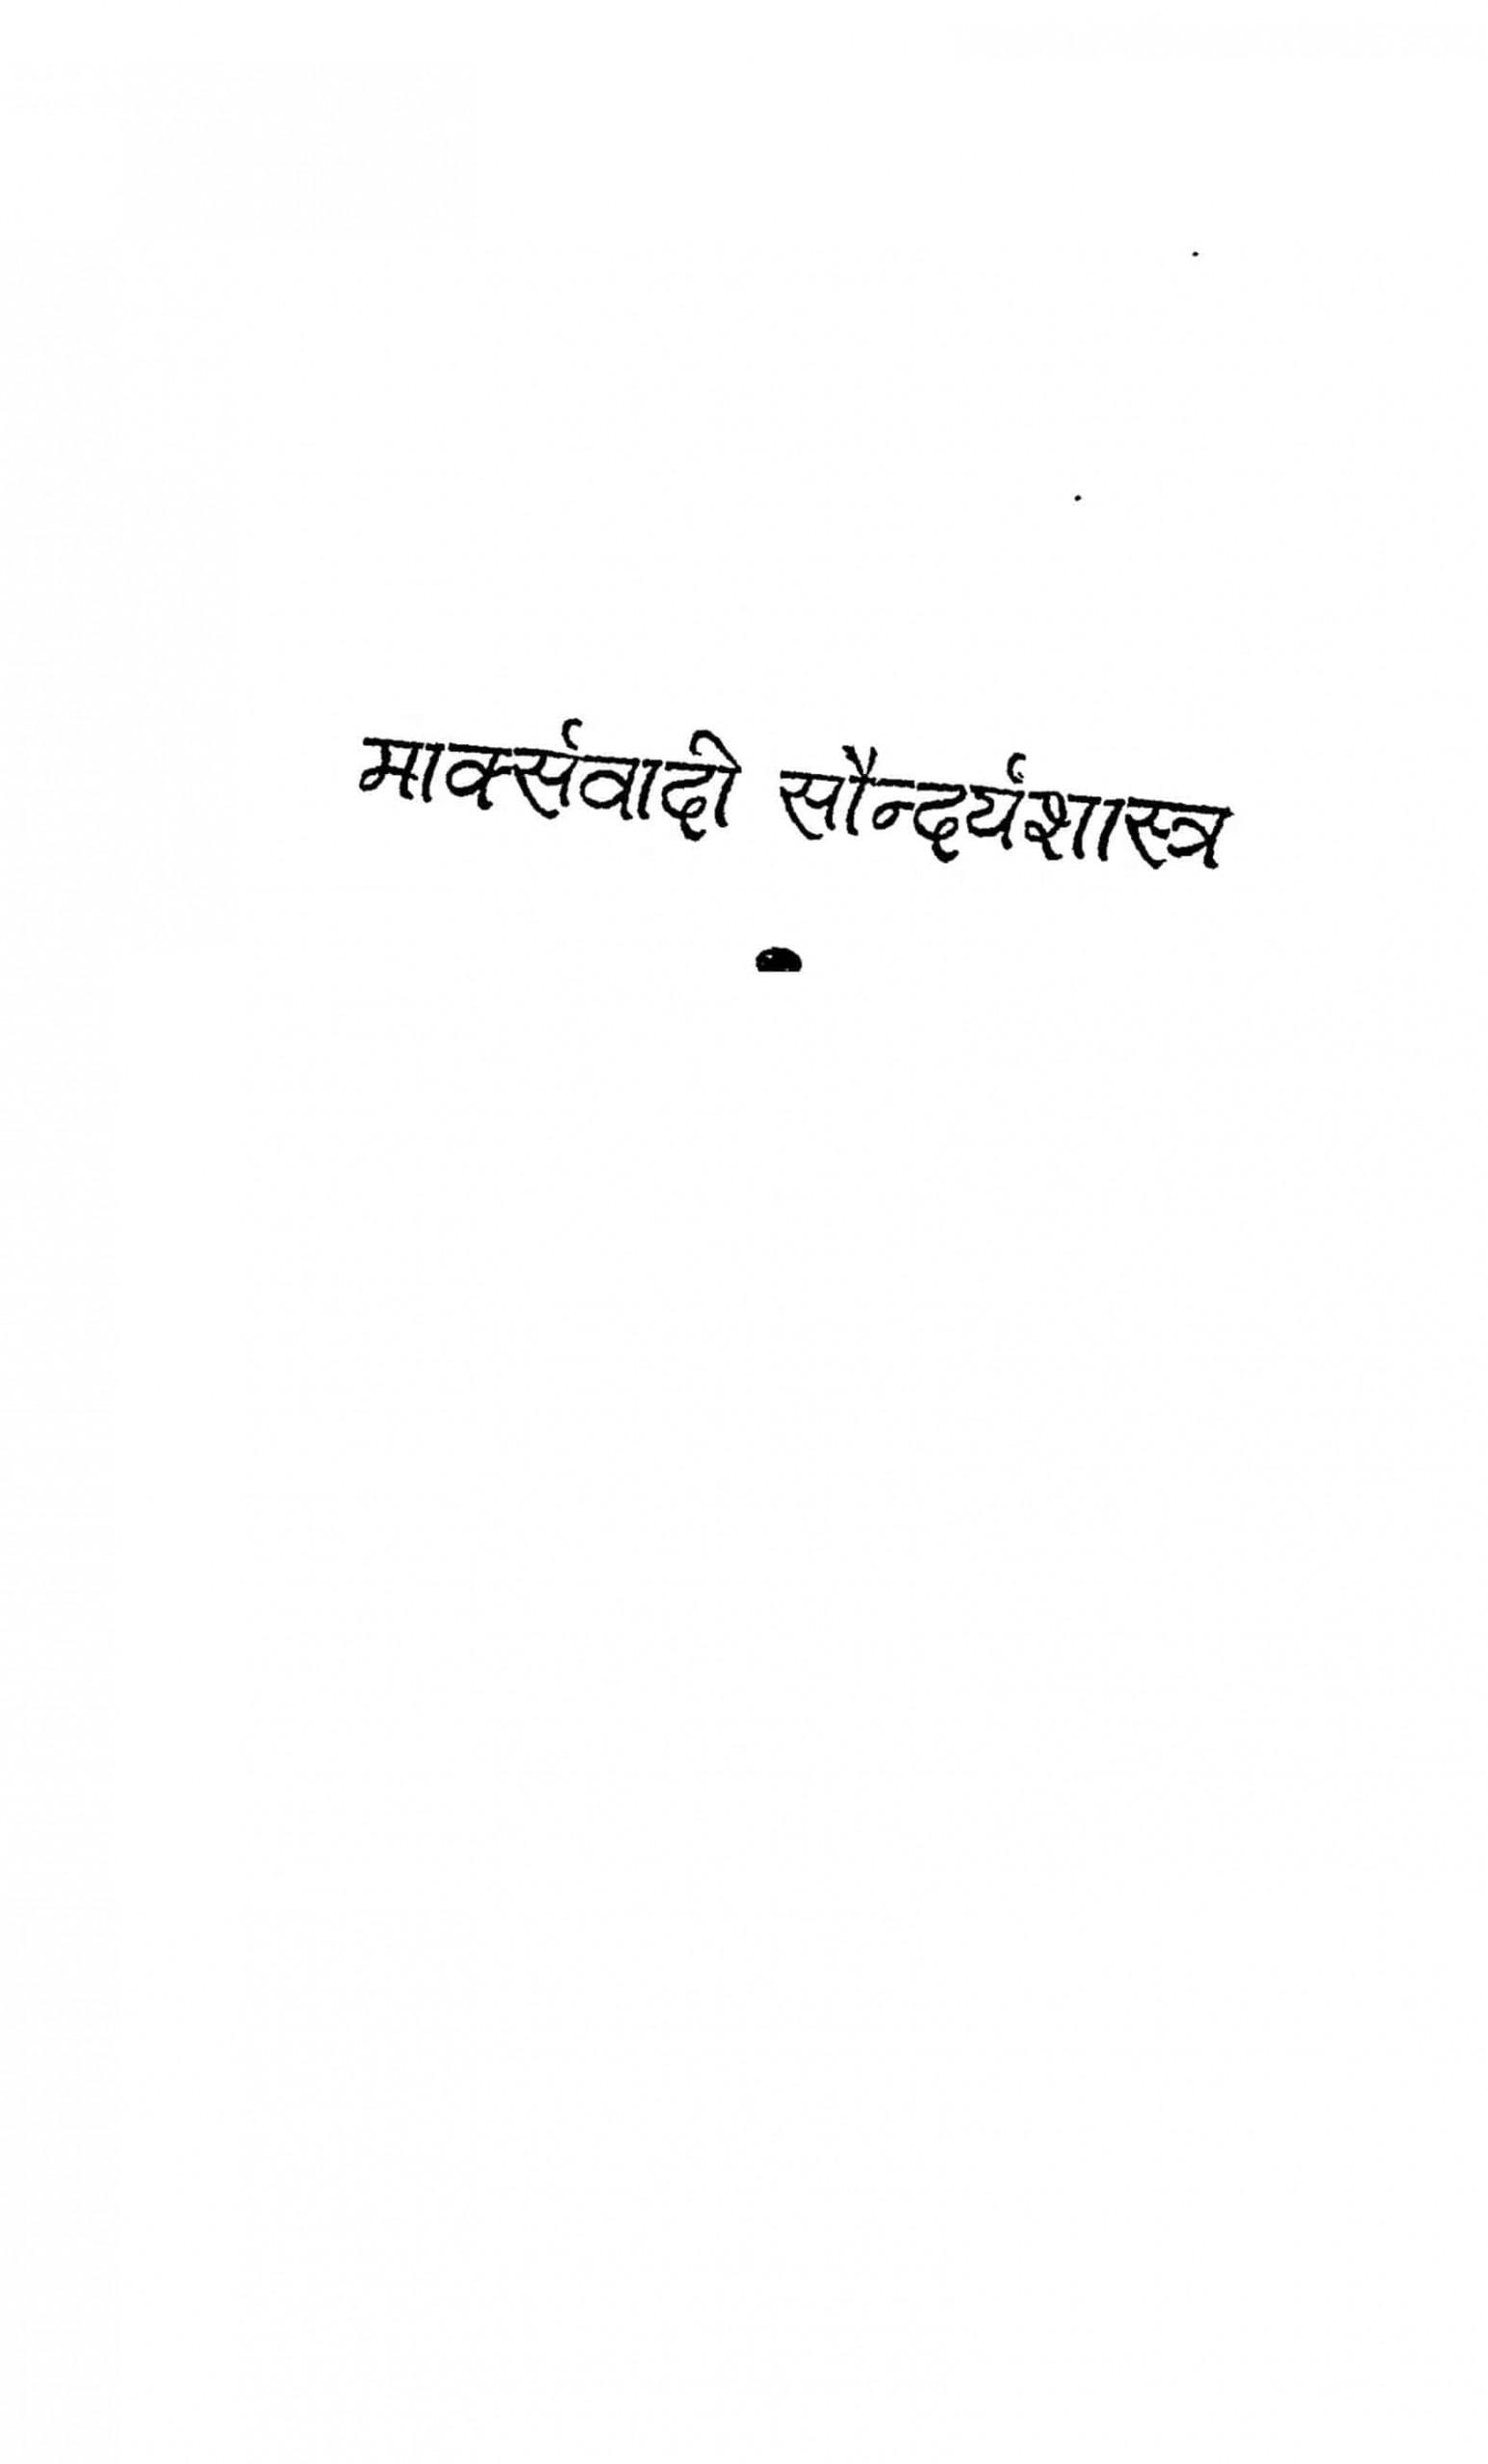 Marksavadi Saundaryashastra  by कमला प्रसाद - Kamala Prasad